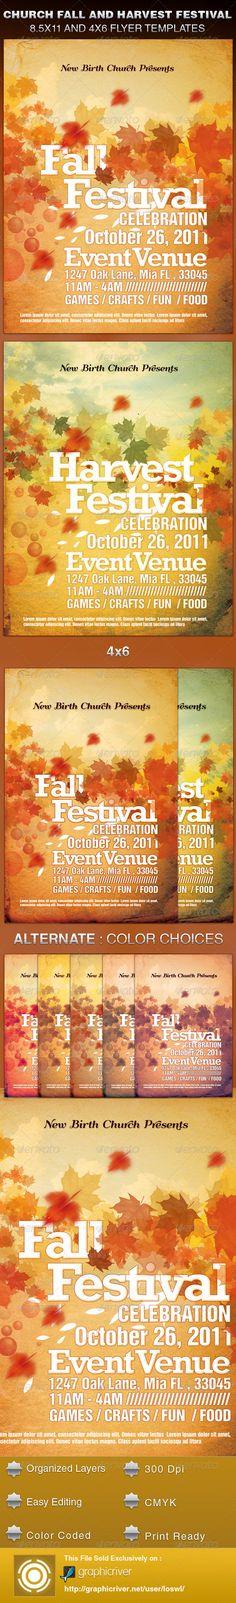 Harvest Festival Church Flyer Template Flyer Template Photoshop